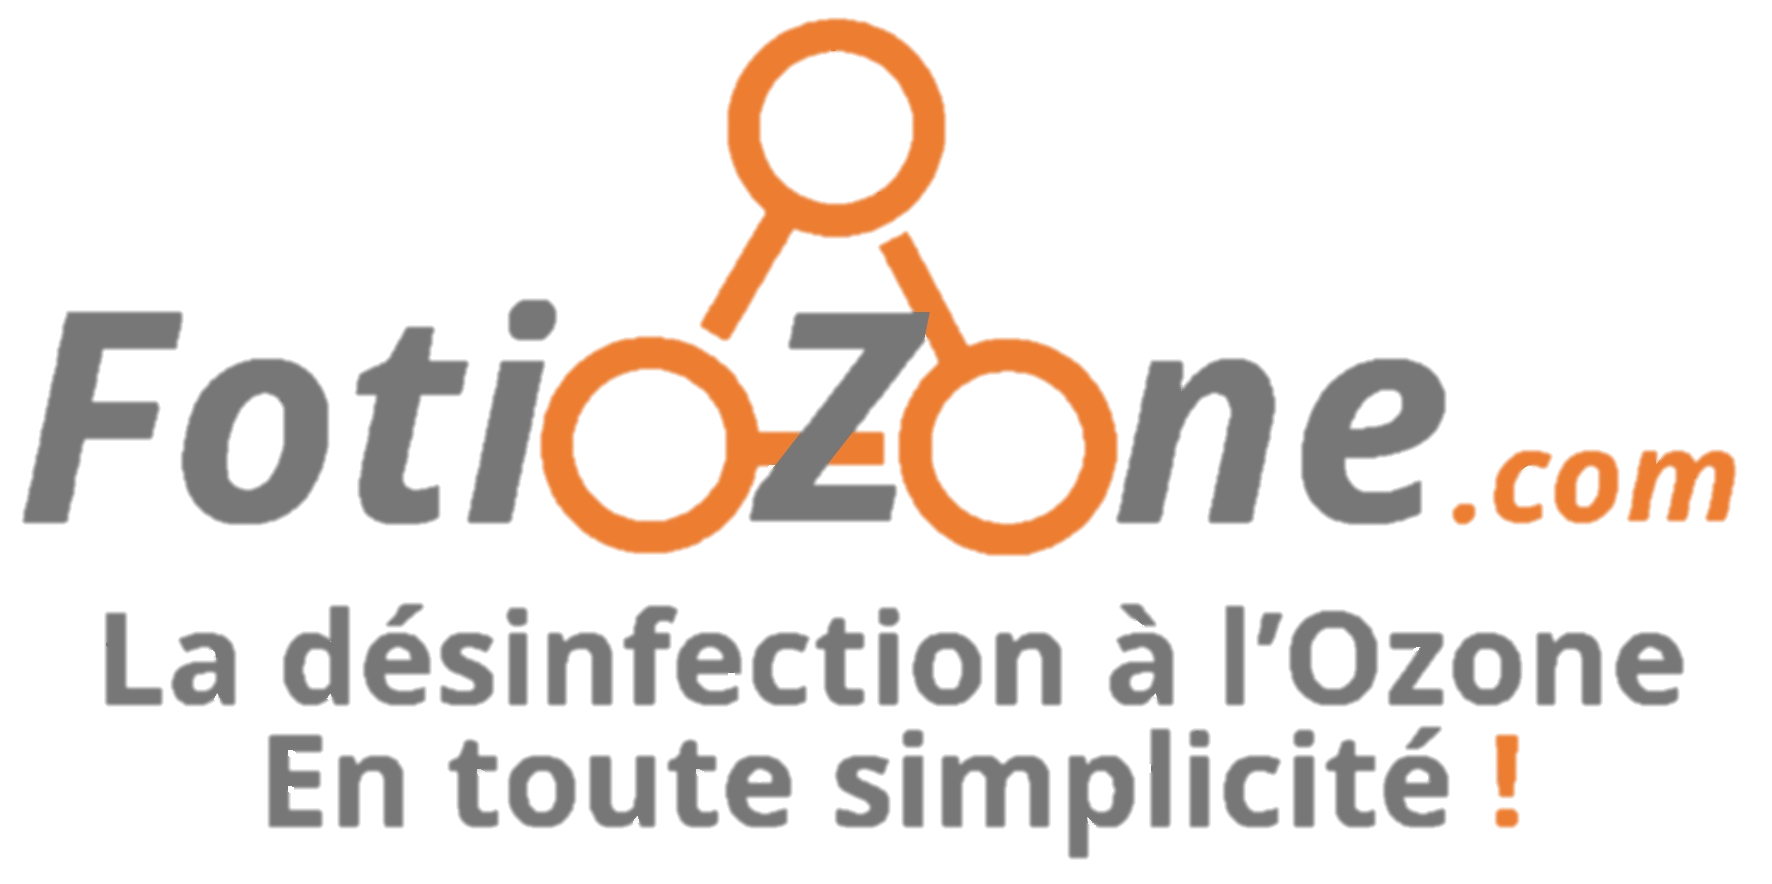 Fotiozone.com